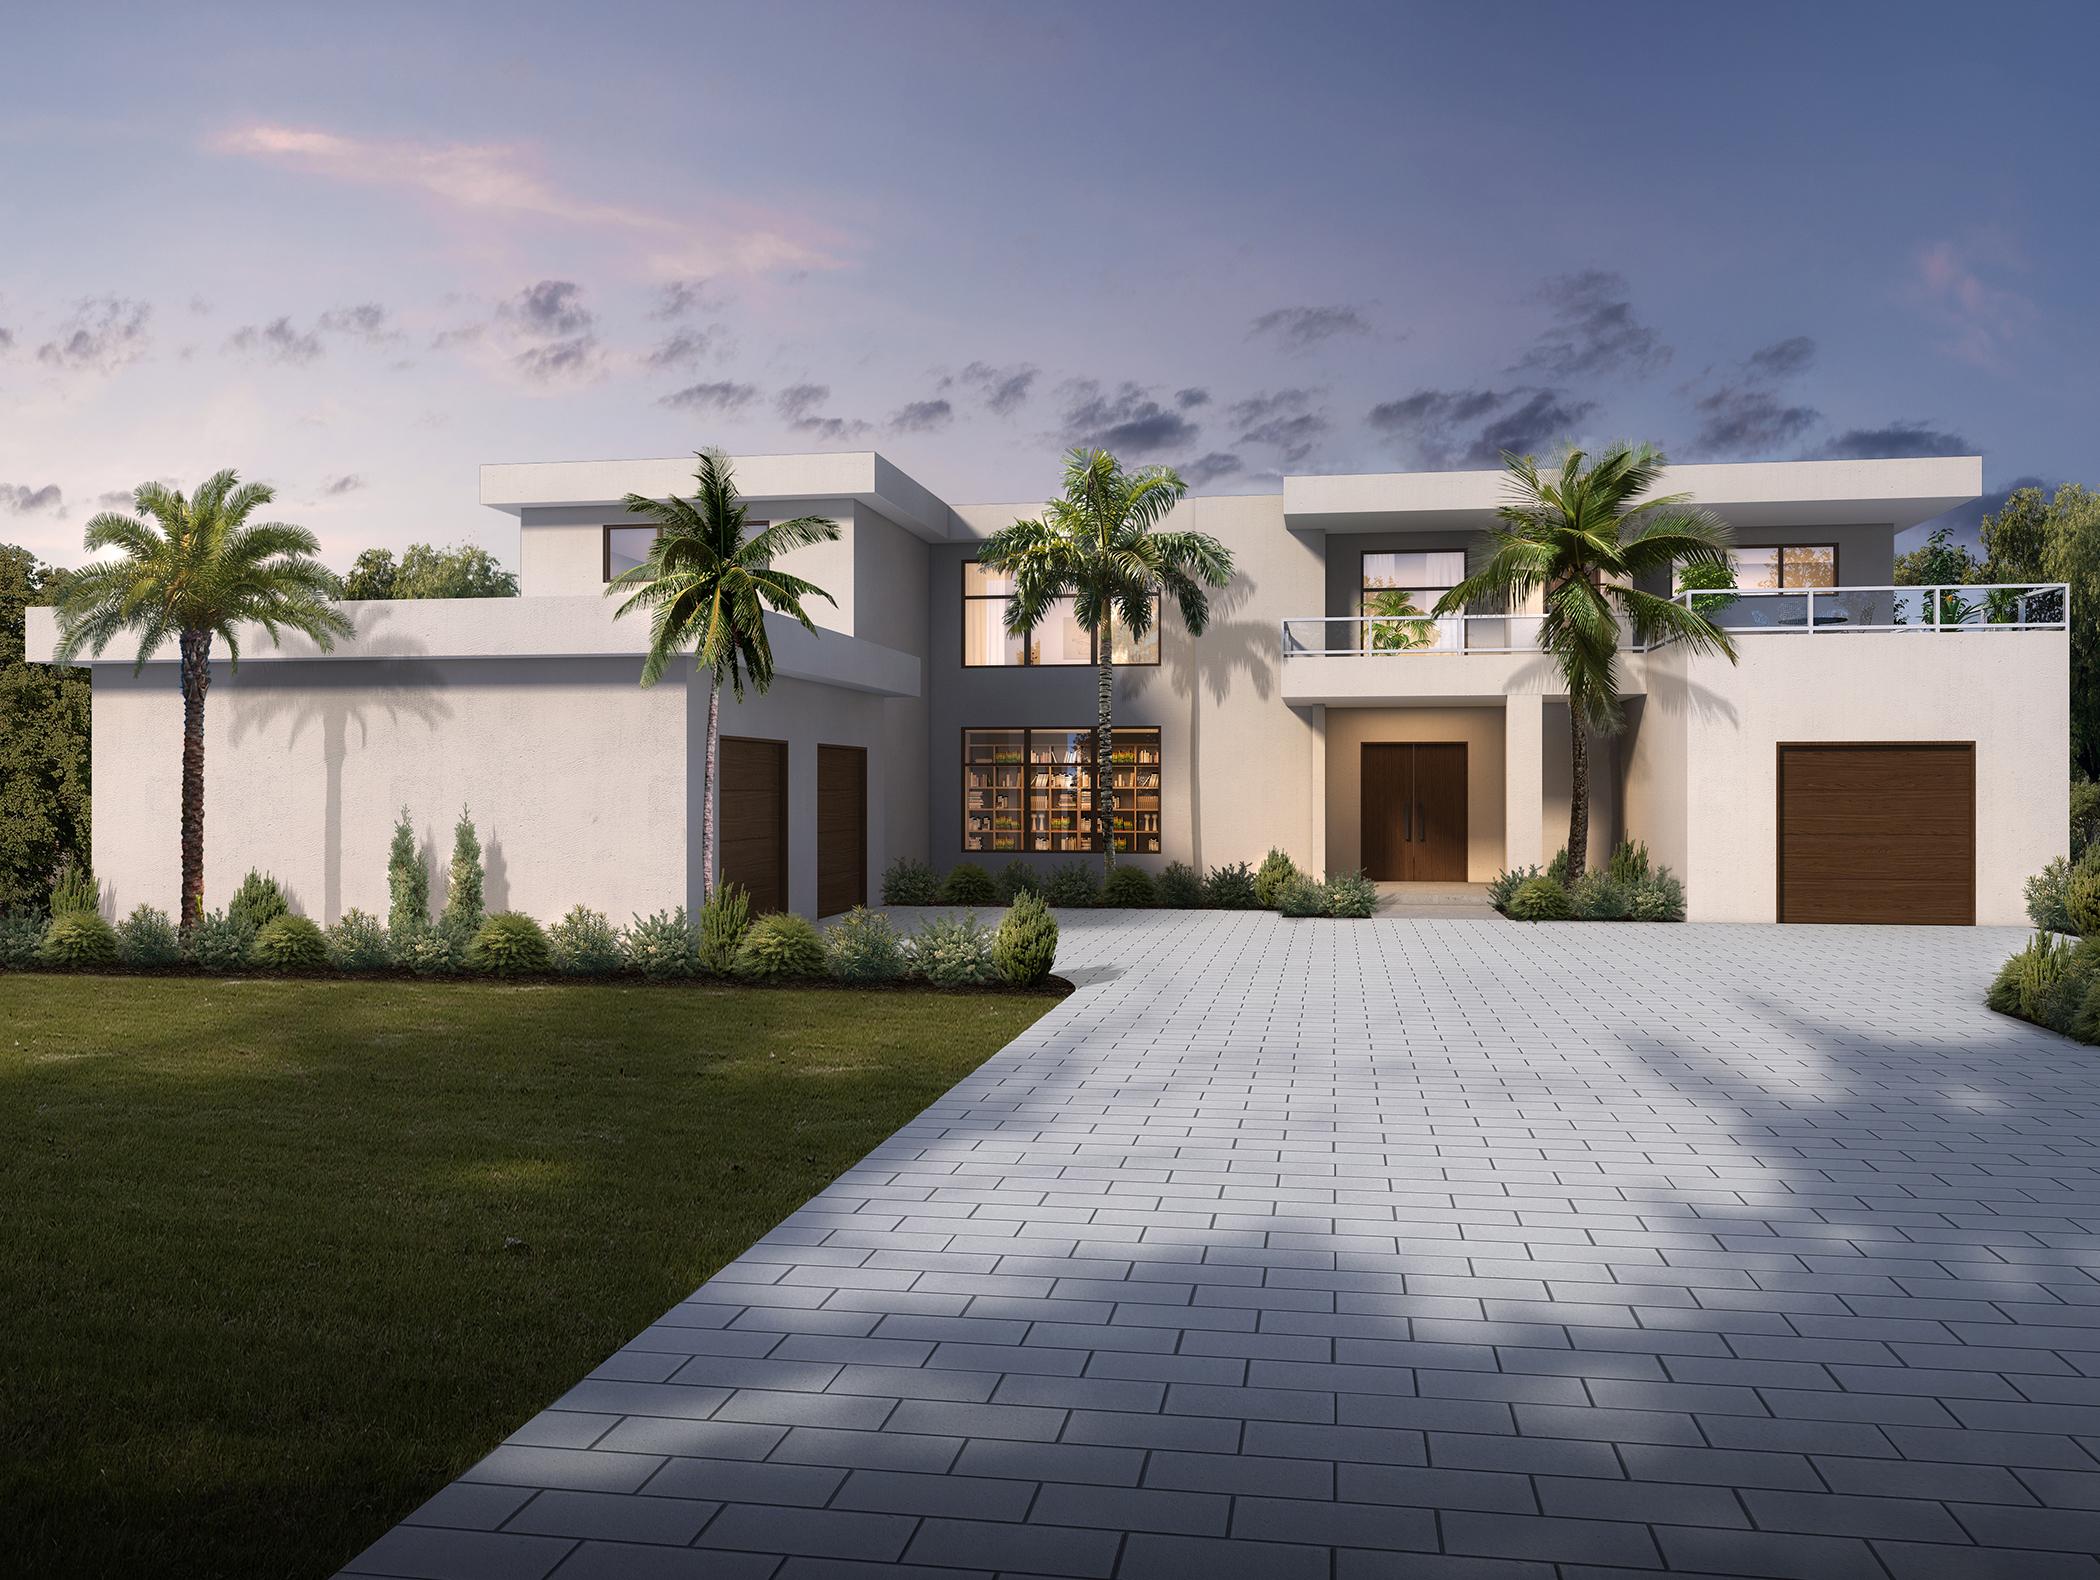 Coastal Contemporary 1 House Plan